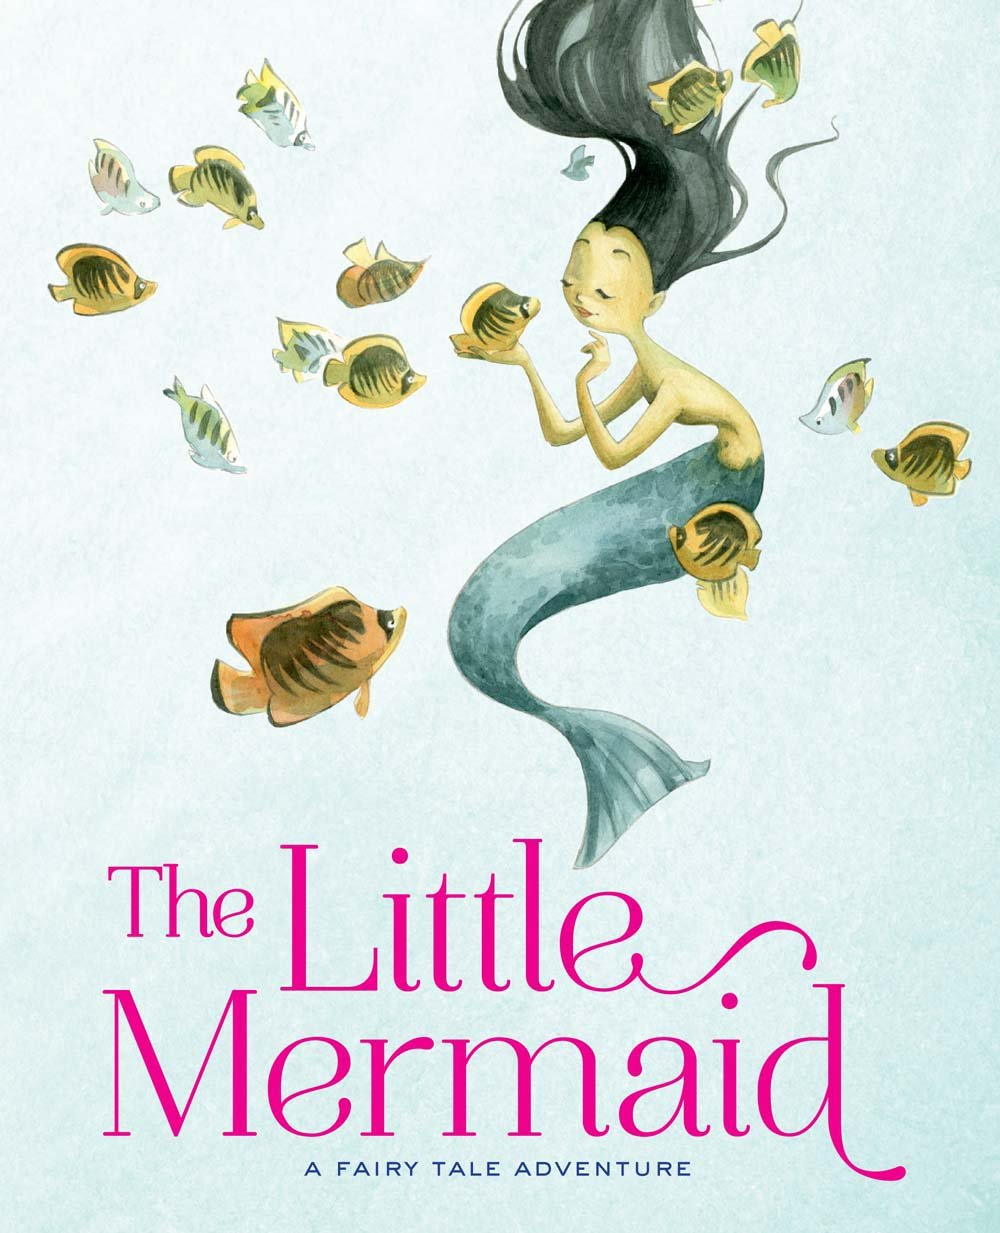 The Little Mermaid: A Fairy Tale Adventure (Fairy Tale Adventures) ebook